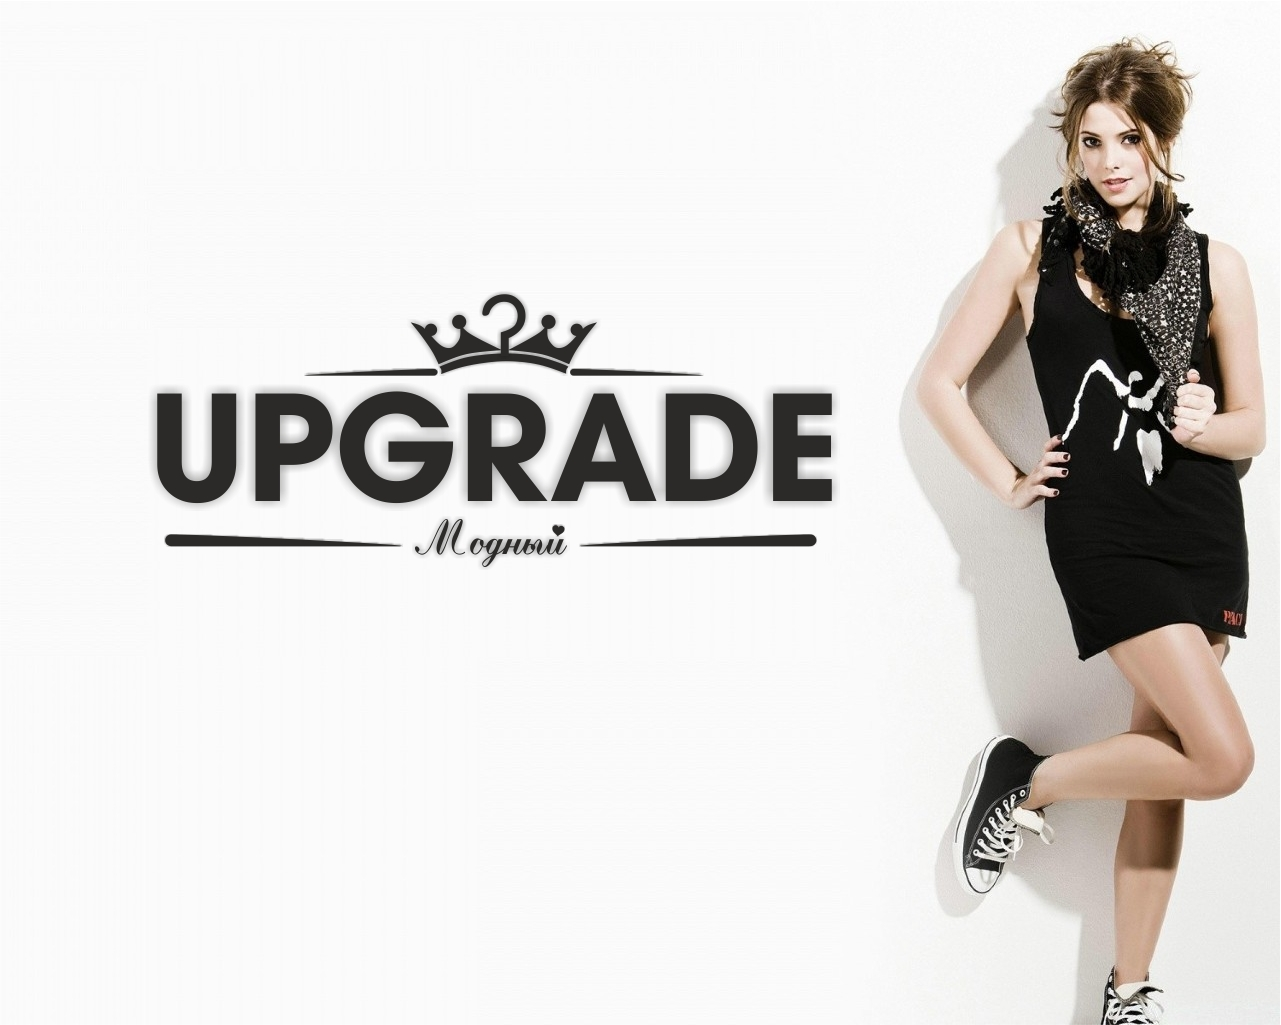 "Логотип интернет магазина ""Модный UPGRADE"" фото f_72459483e6bb4256.jpg"